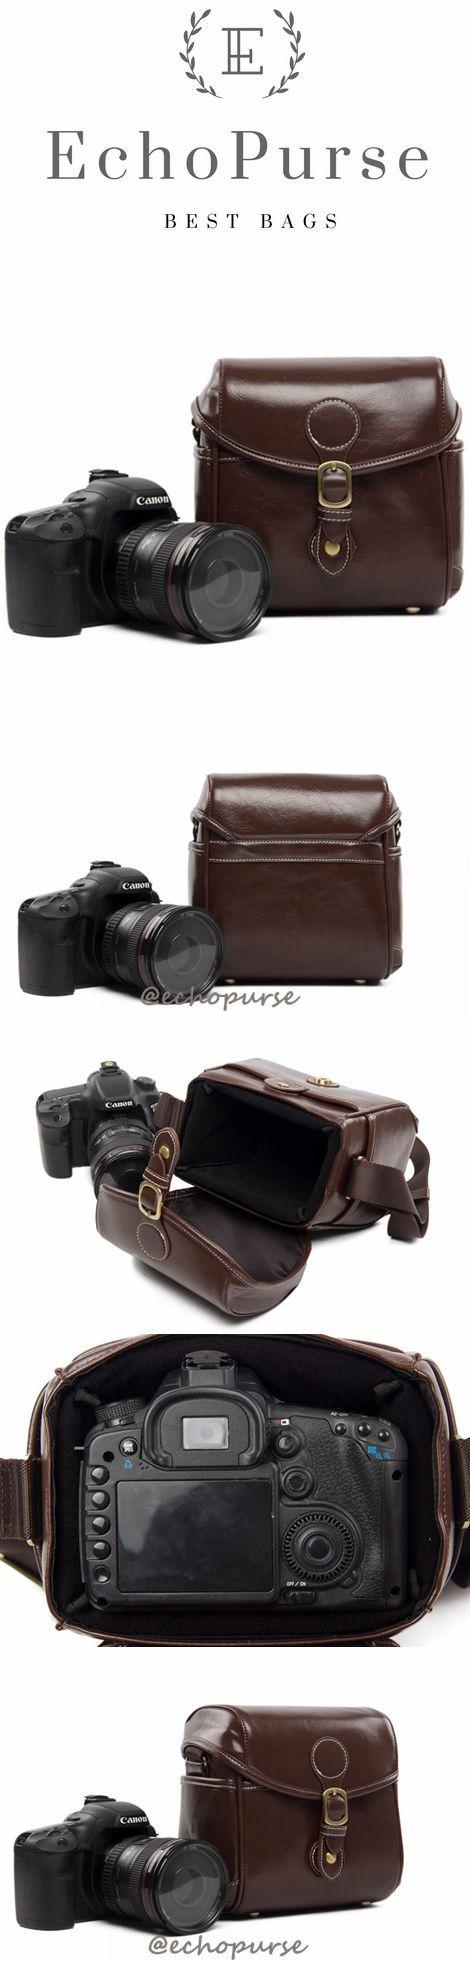 Hot Sale PU Leather DSLR Camera Purse, Coffee SLR Camera Case 288